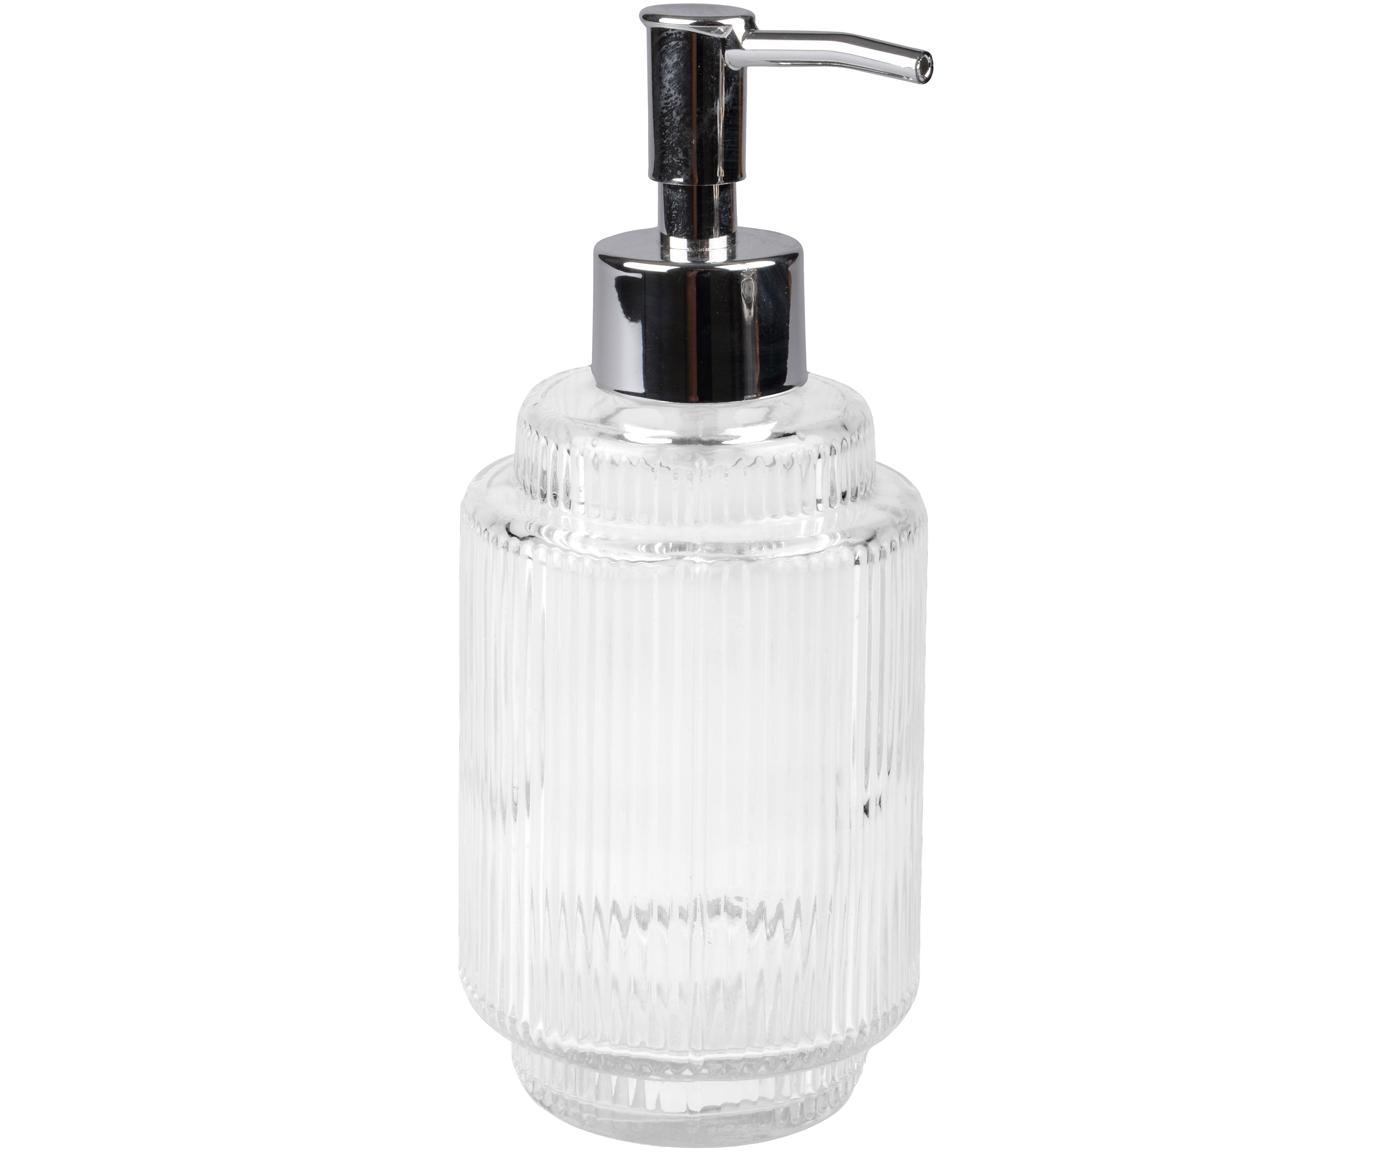 Zeepdispenser Ligia van geribbeld glas, Glas, Transparant, zilverkleurig, Ø 8 cm